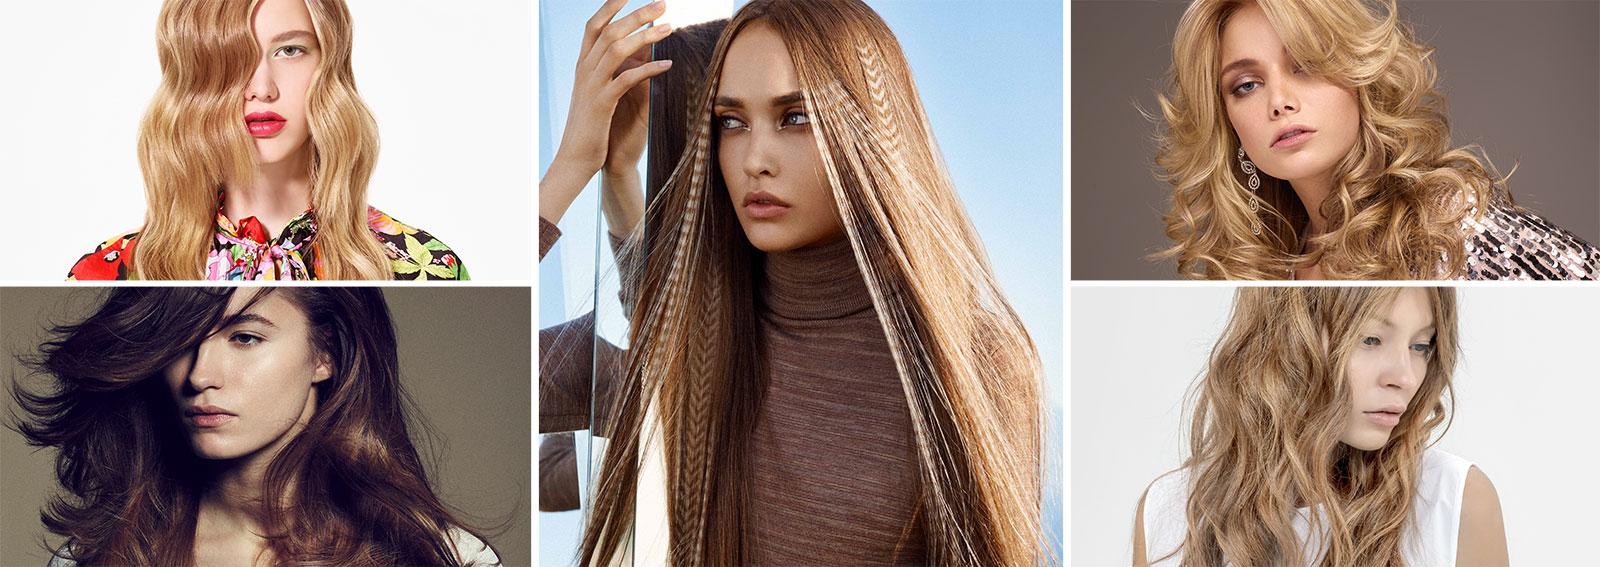 tagli-capelli-saloni-primavera-estate-2019-desktop